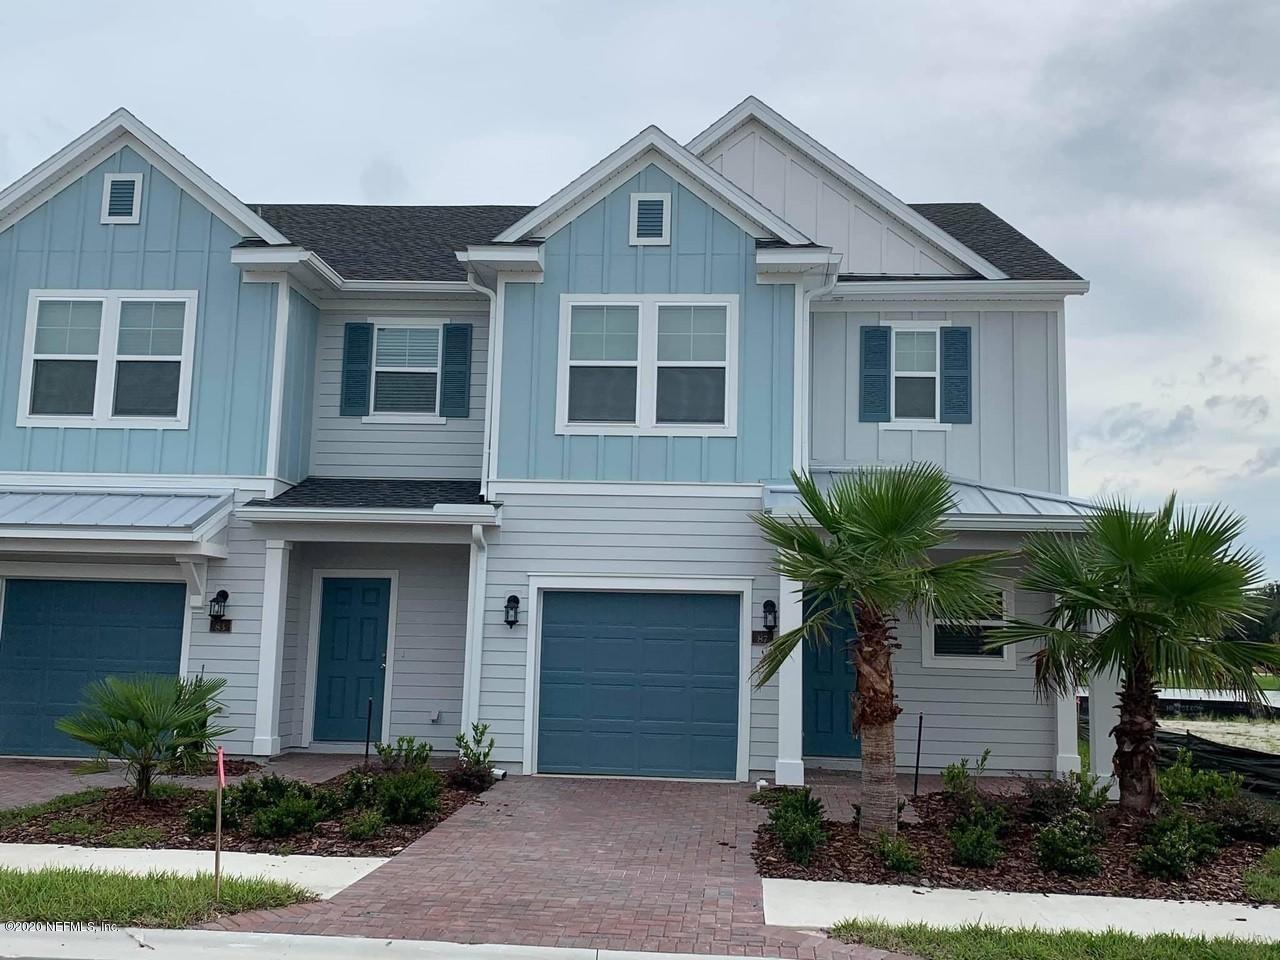 10292 ALDER CREEK, JACKSONVILLE, FLORIDA 32222, 3 Bedrooms Bedrooms, ,2 BathroomsBathrooms,Residential,For sale,ALDER CREEK,1083332